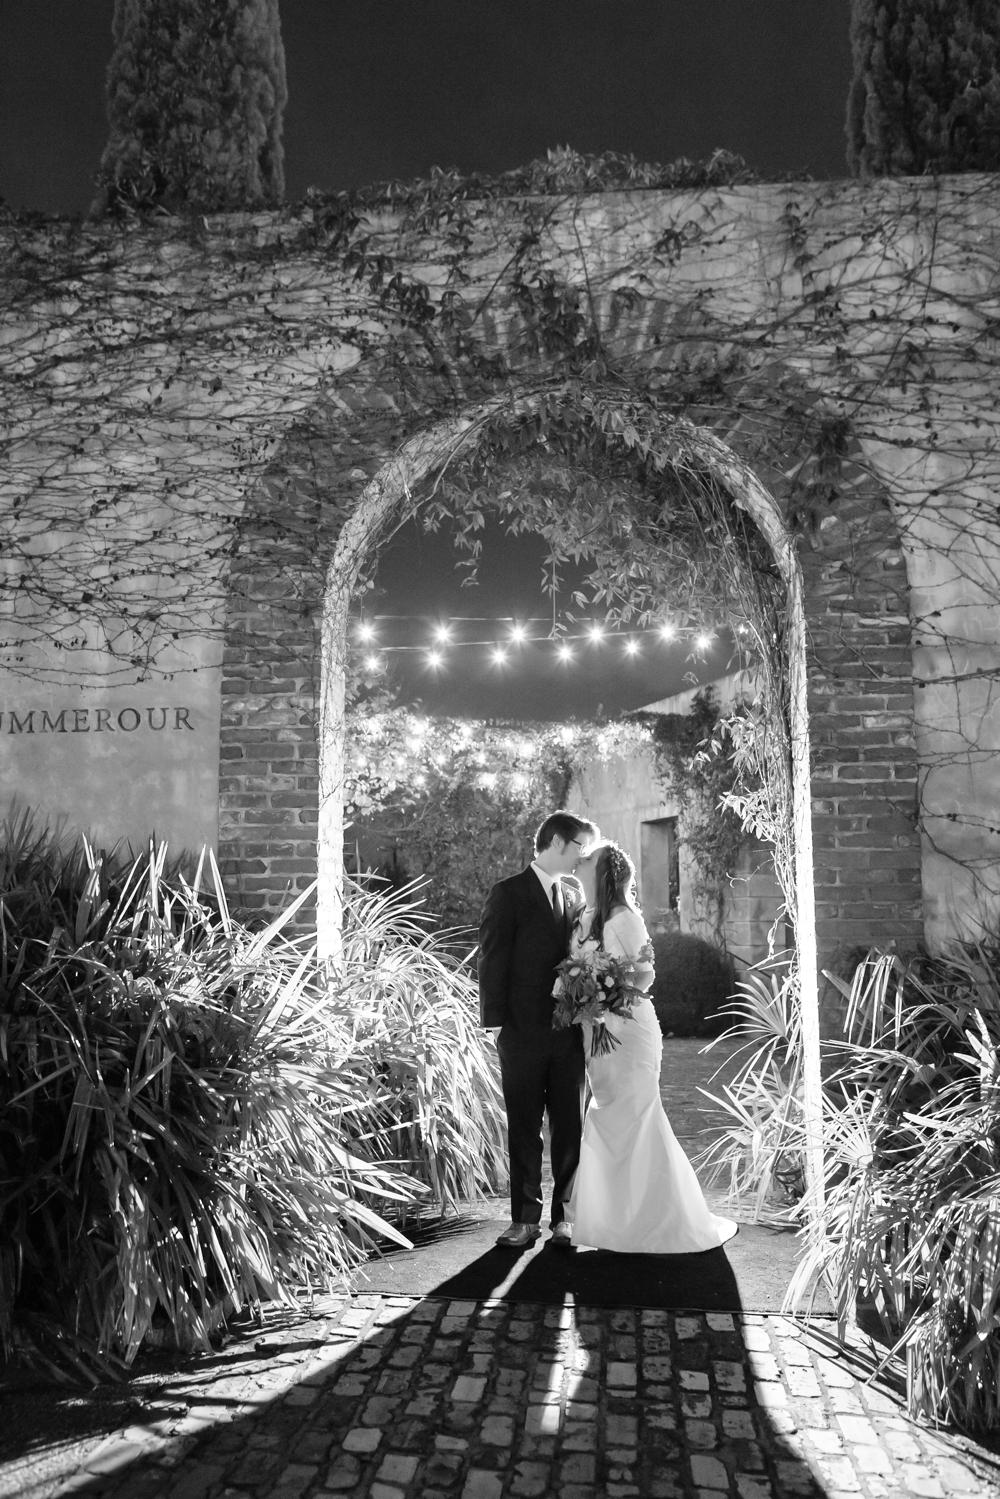 Summerour-Wedding-Photos029